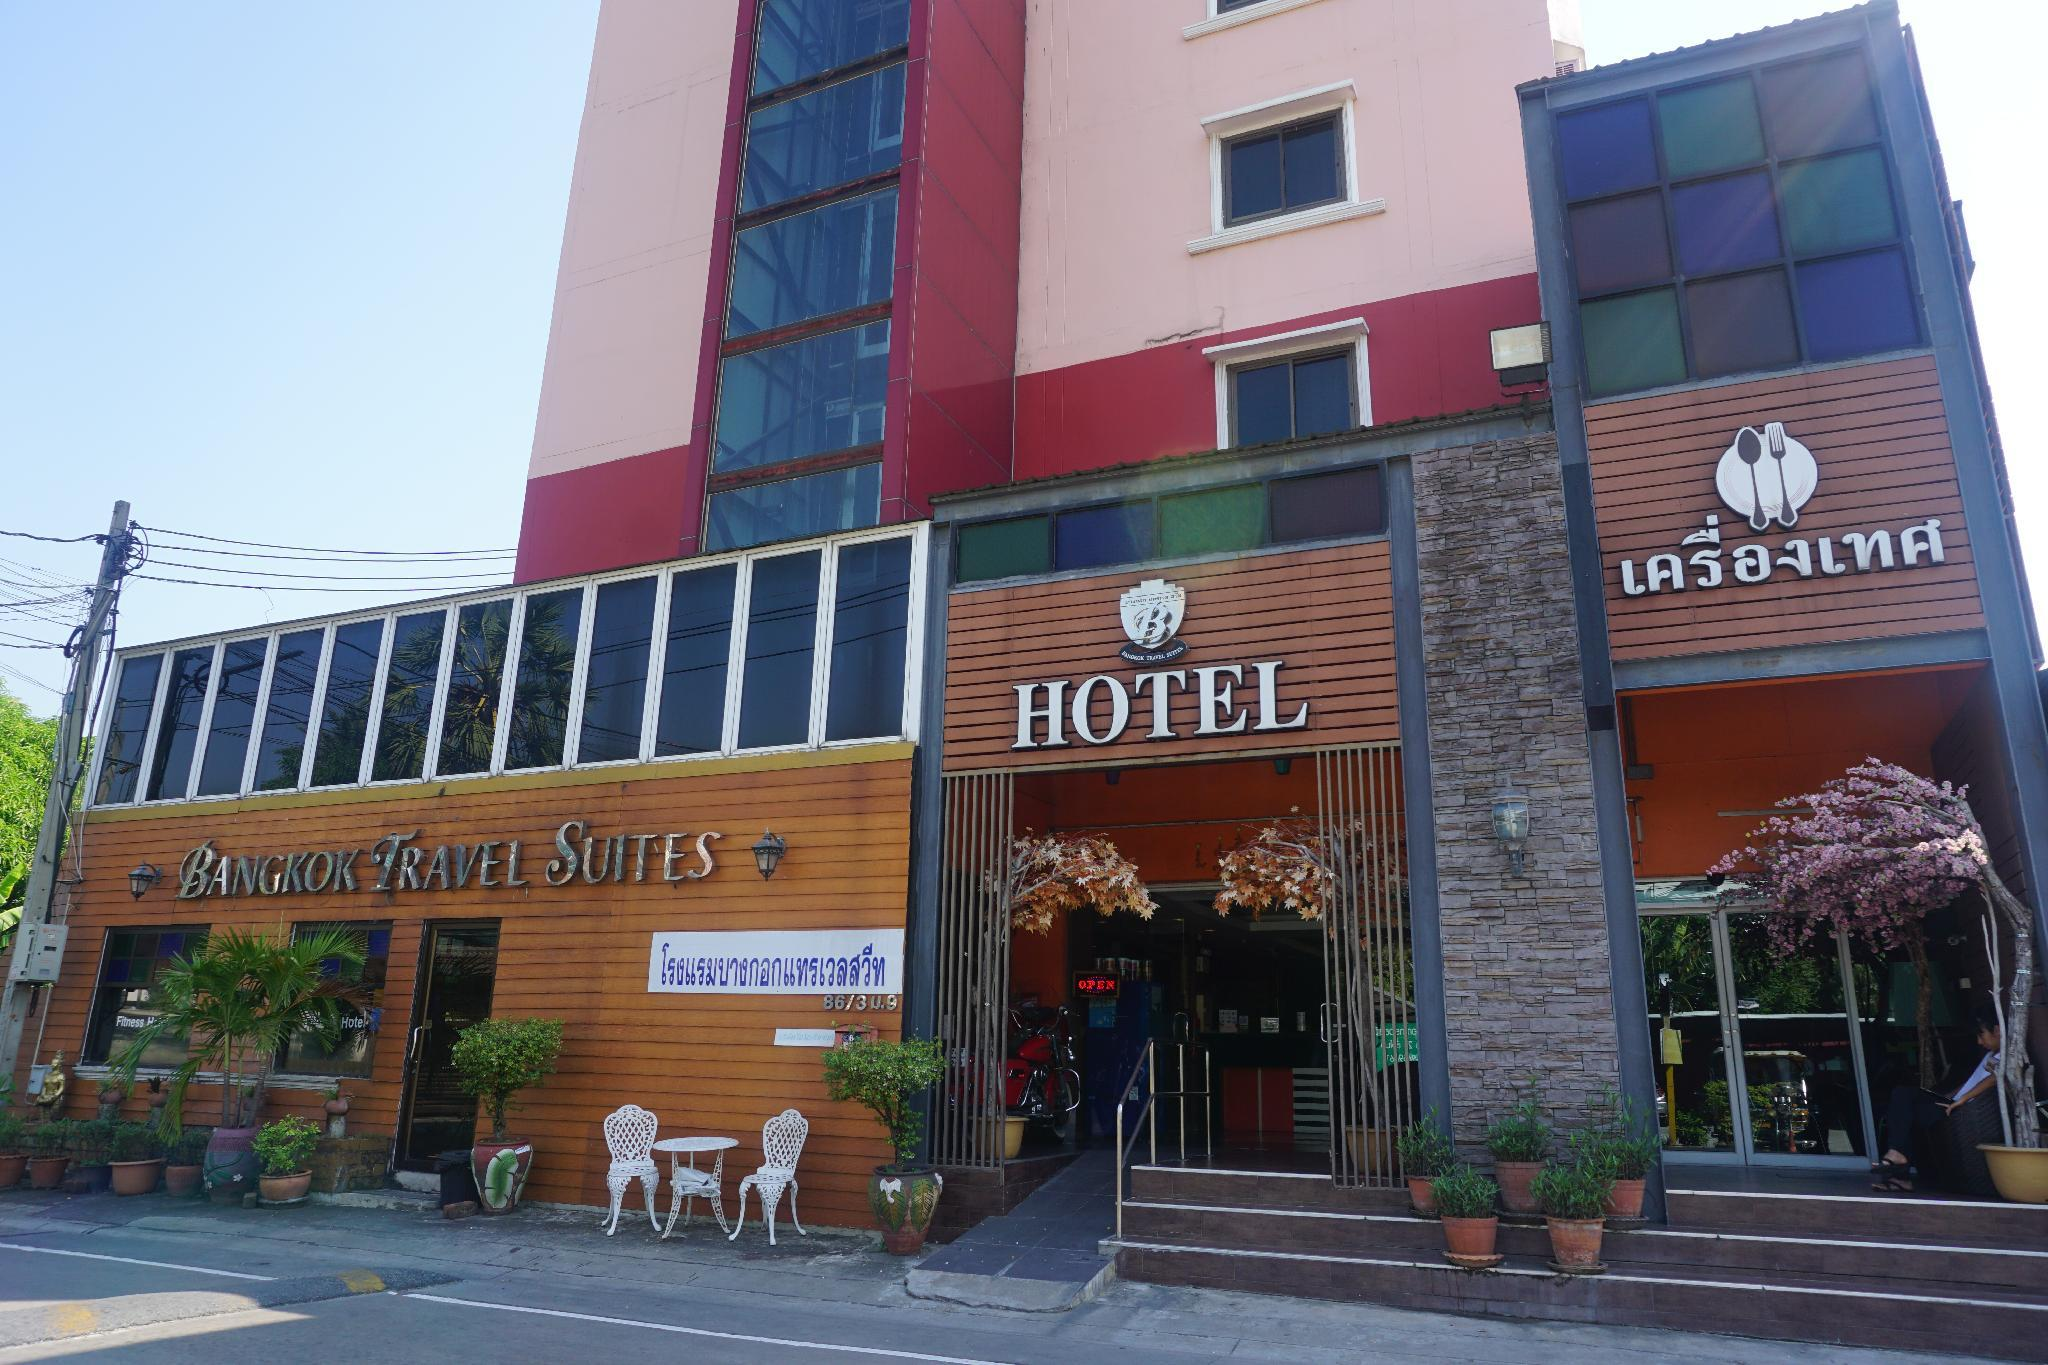 Bangkok Travel Suites Hotel